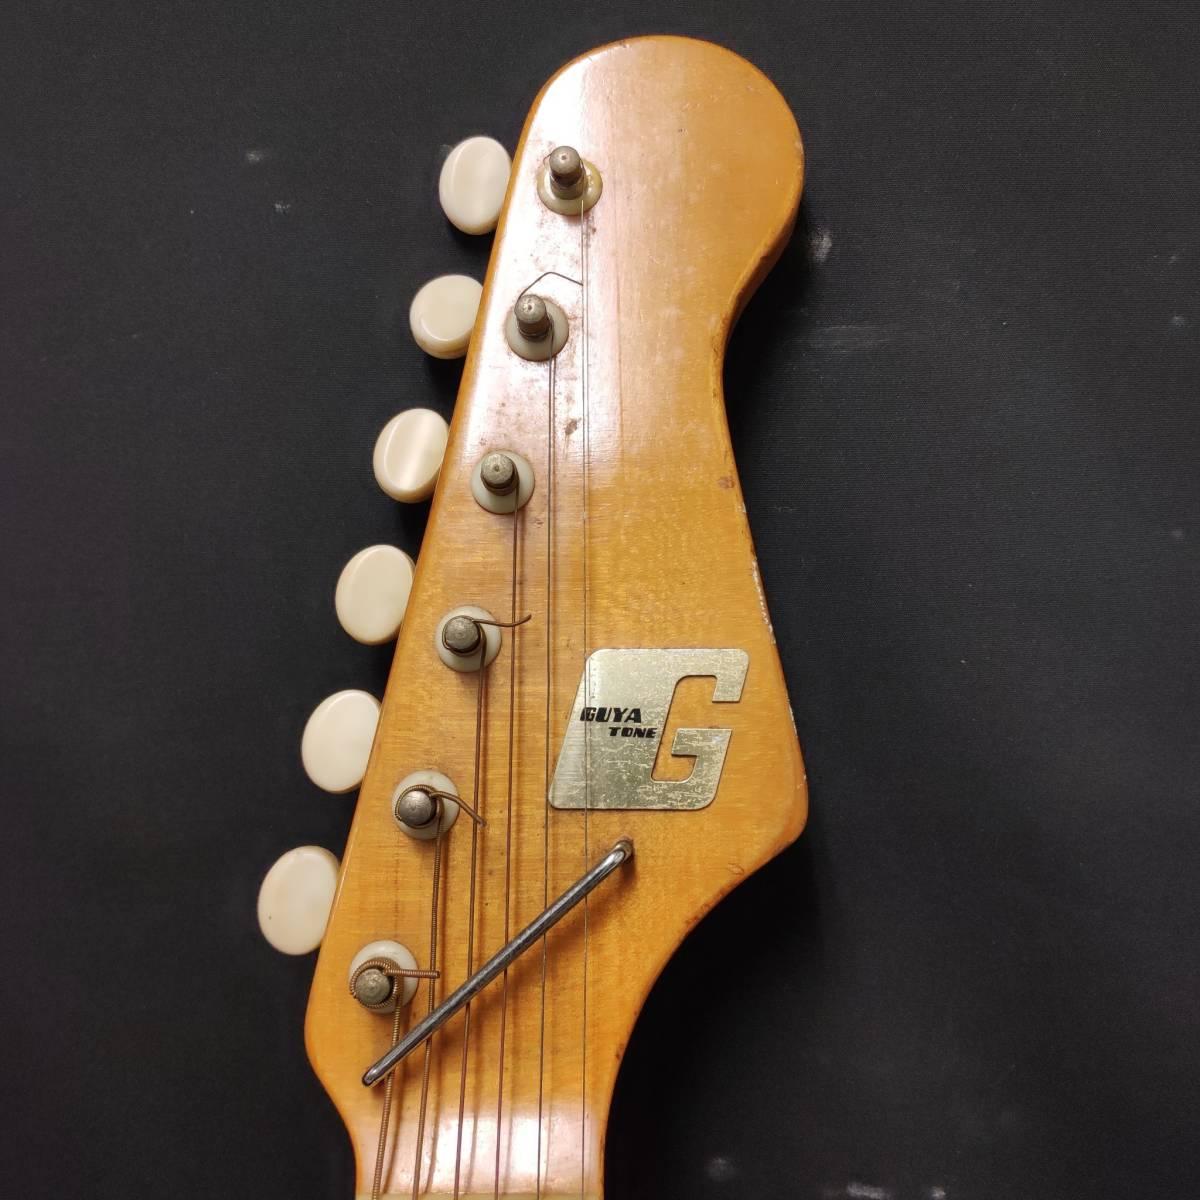 A22m11T GUYA TONE エレキギター LG-85T 本体 約100cm グヤトーン ビンテージ レッド 赤色_画像2